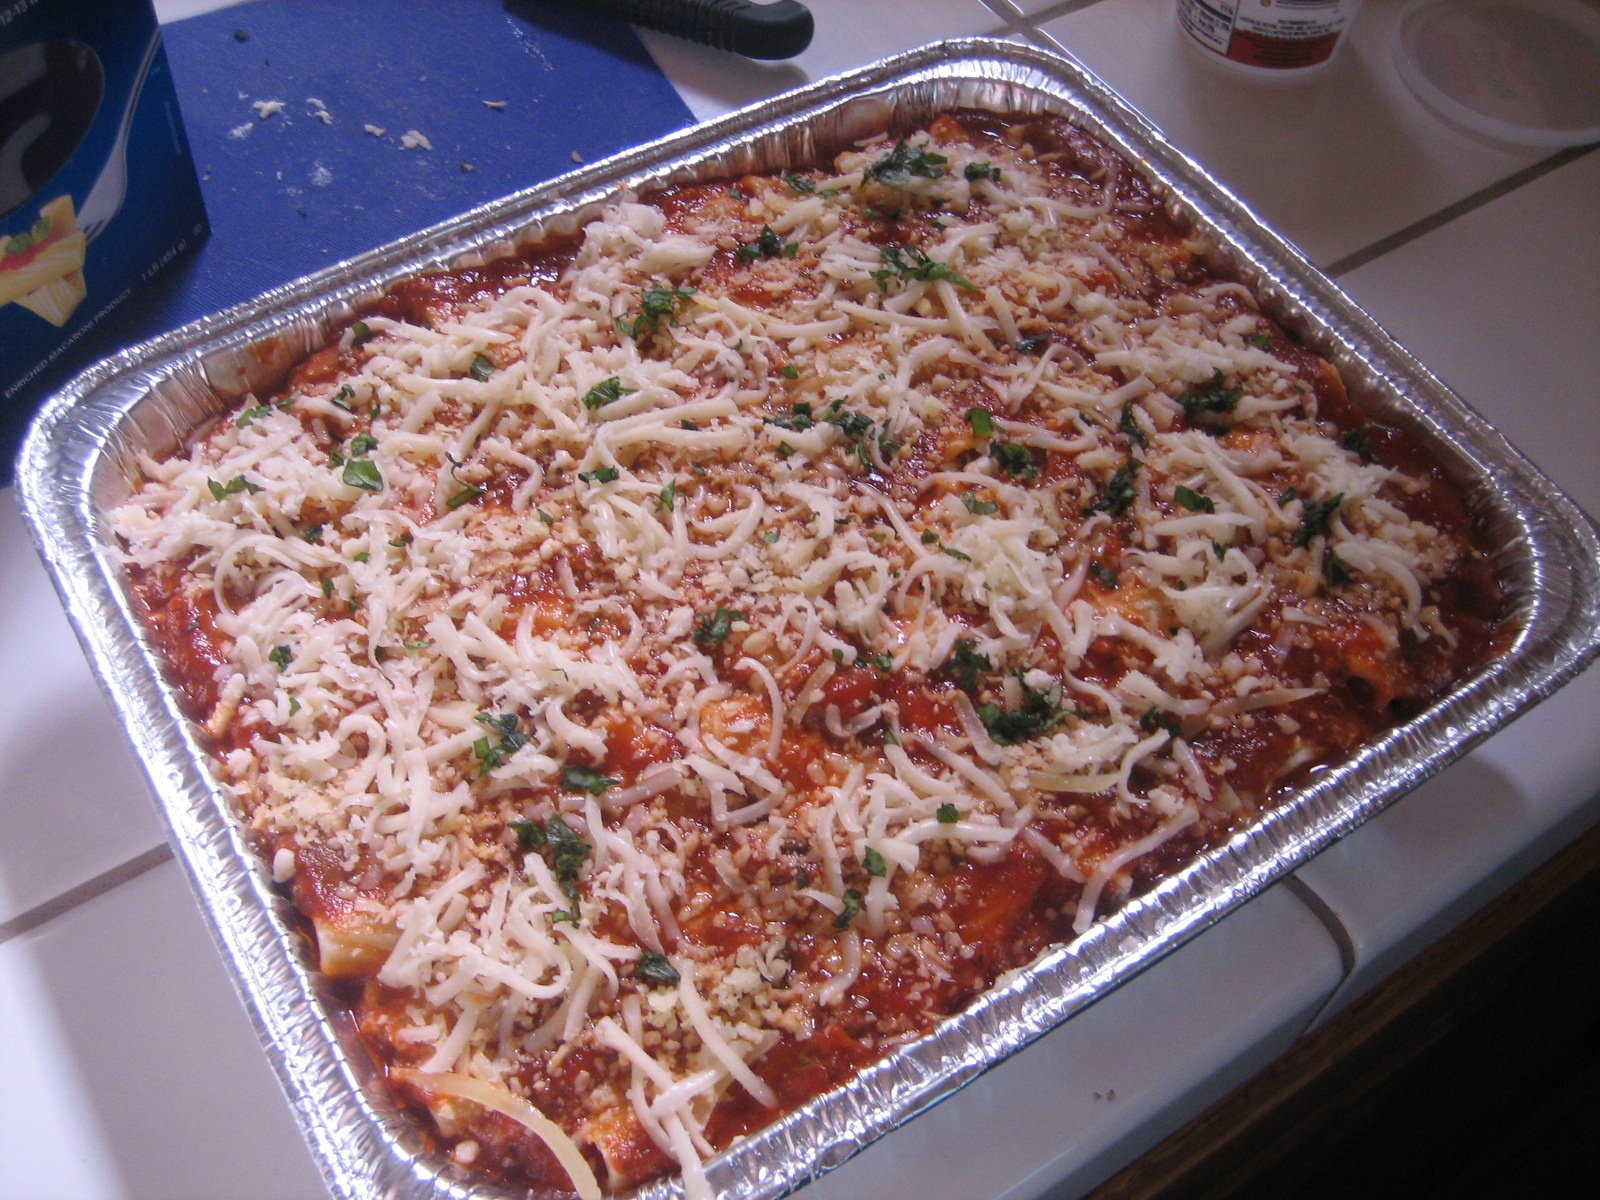 ... Appetito Italian Recipes: Italian Rigatoni with Ricotta Cheese Bake